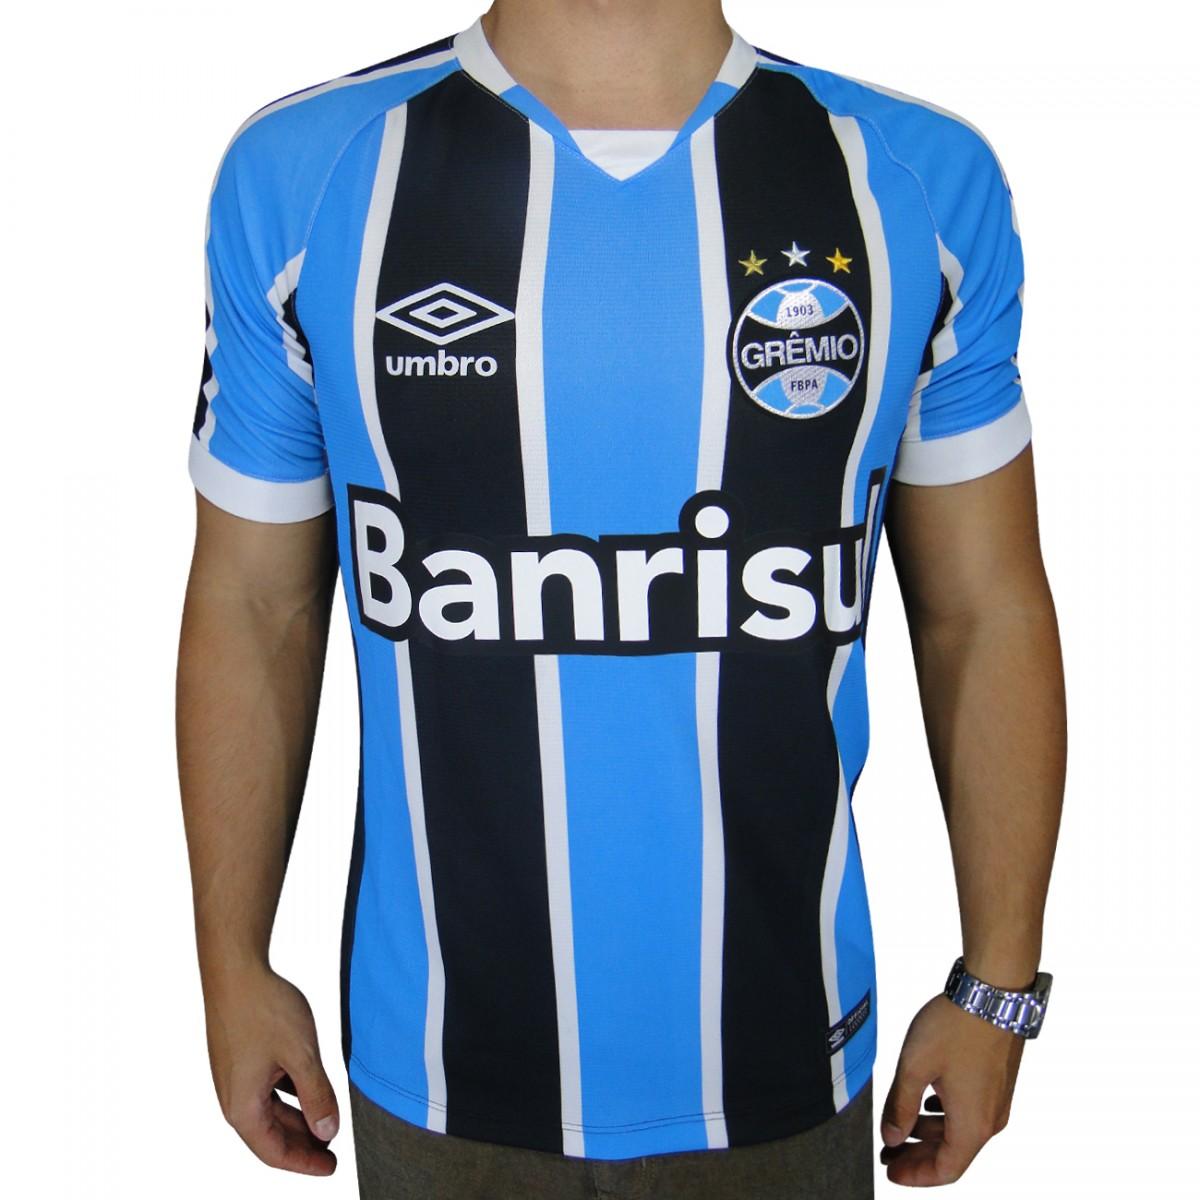 c701a74999 Camisa Gremio Umbro 2016 644562 - Tricolor - Chuteira Nike